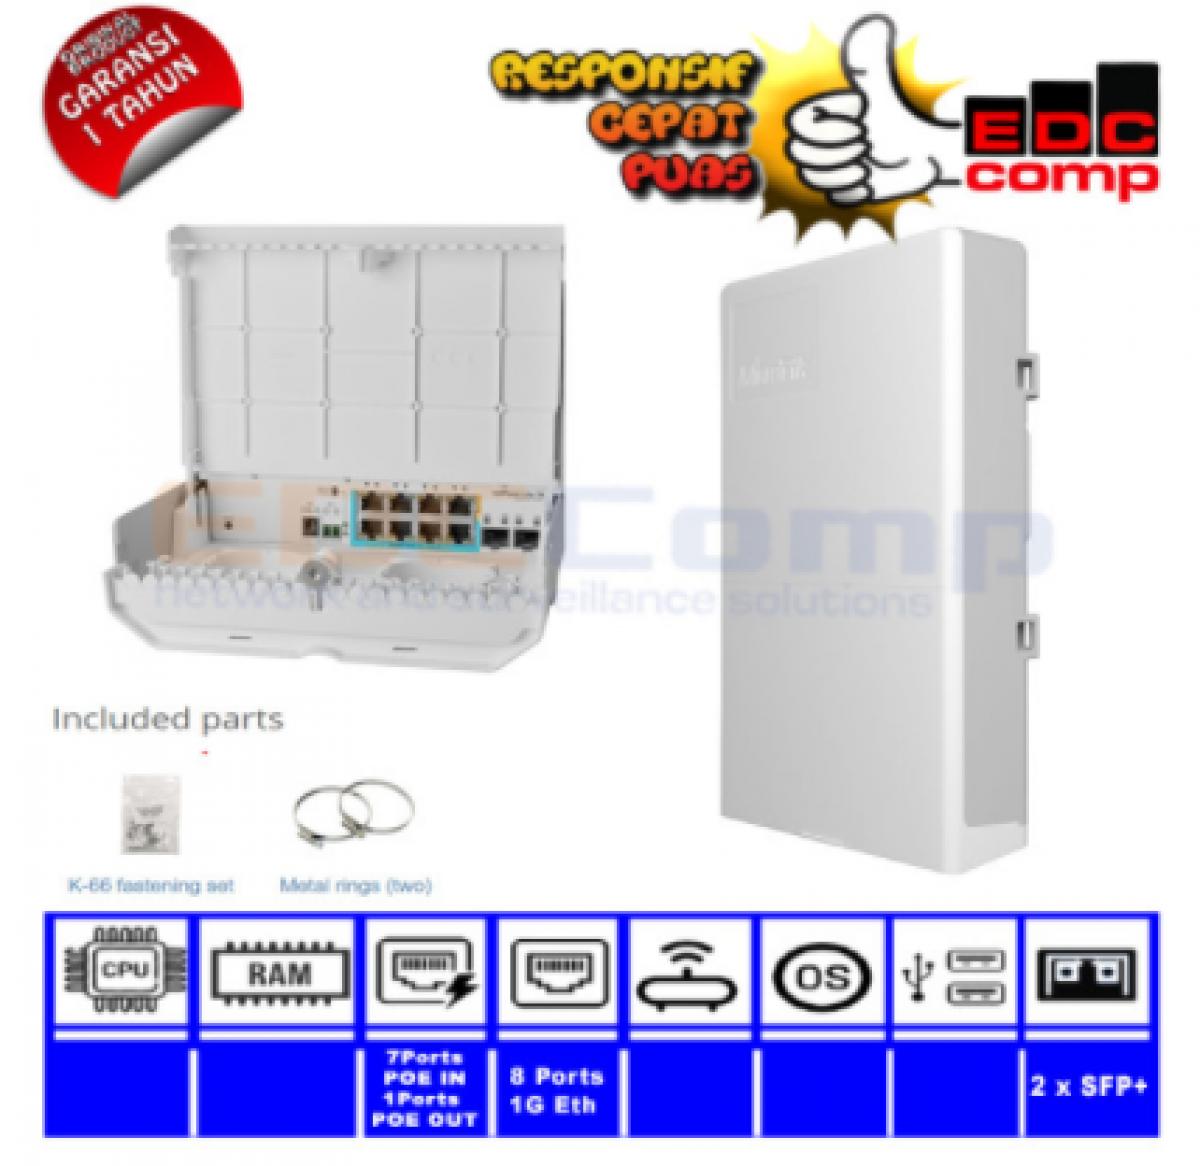 Mikrotik CSS610-1Gi-7R-2S+OUT netPower Lite 7R - EdcComp